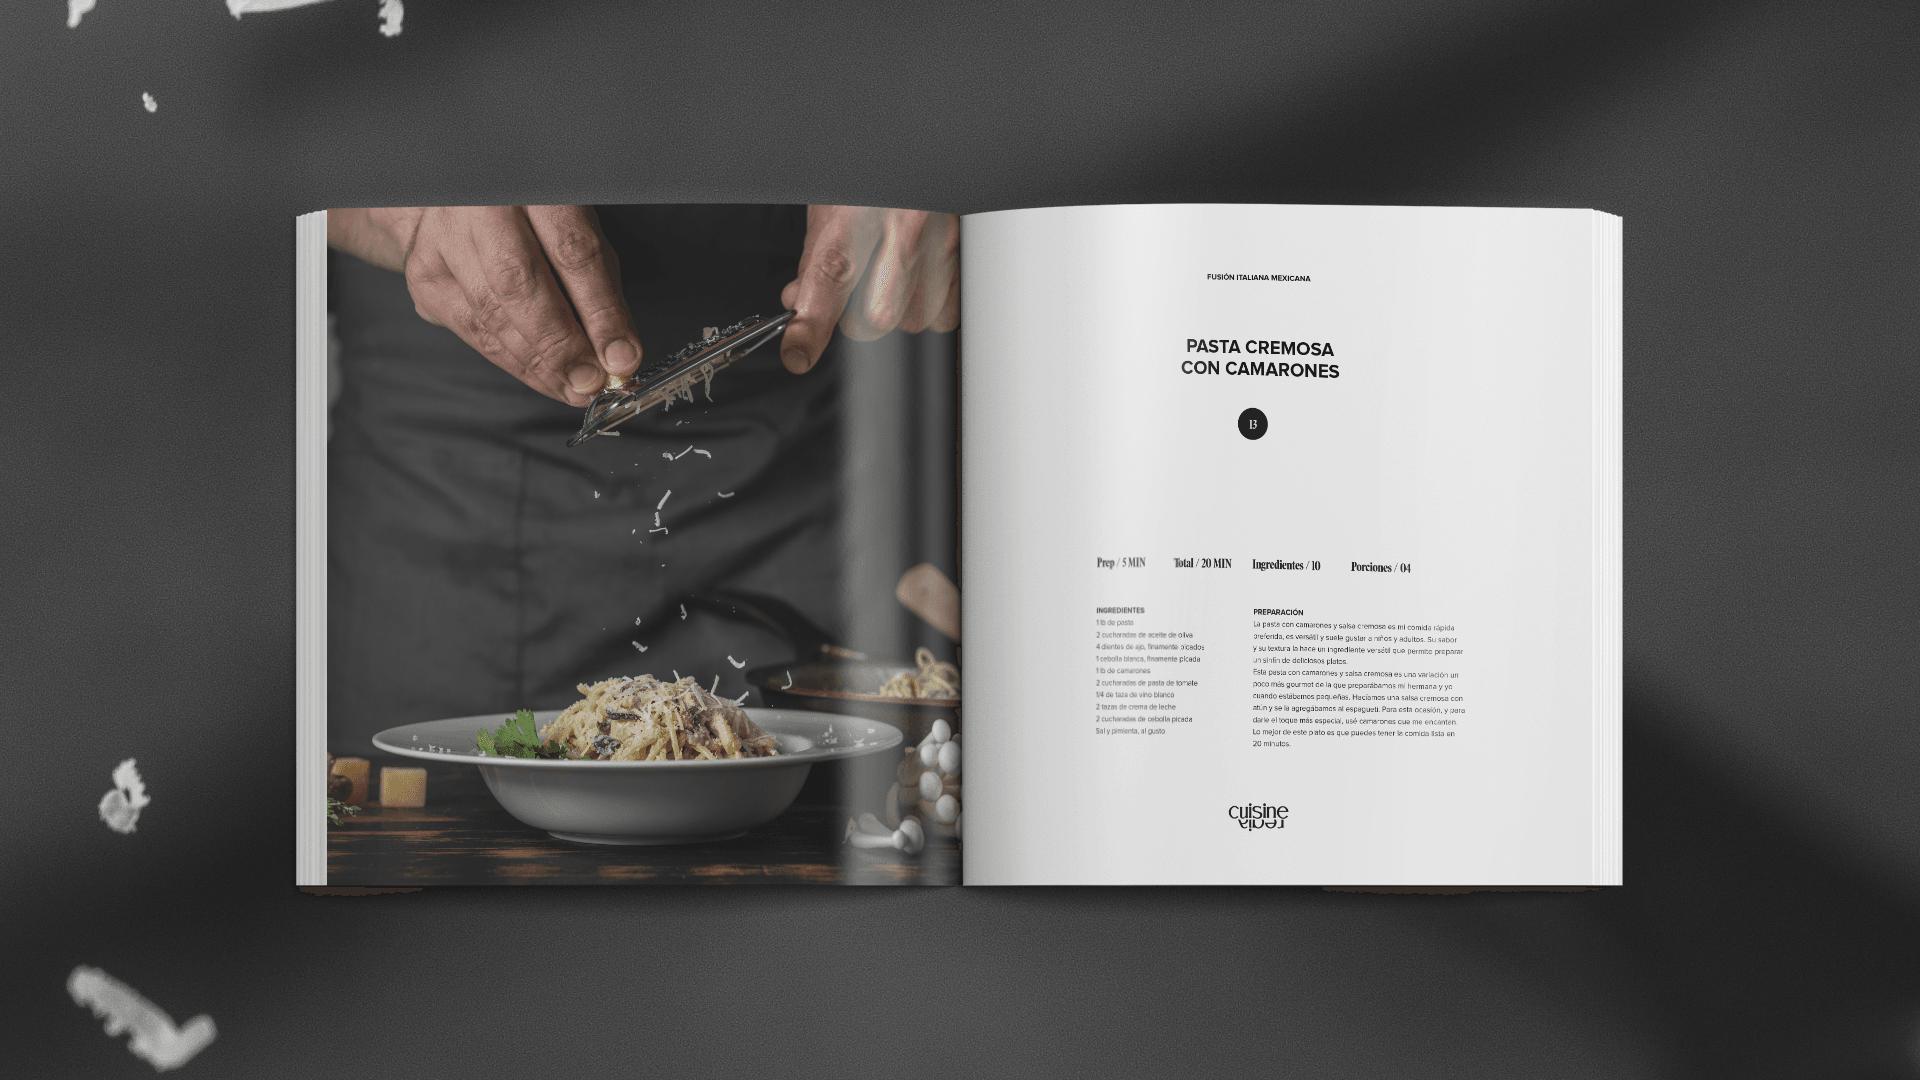 spread03-regia-cuisine-yoenpaperland-compressor